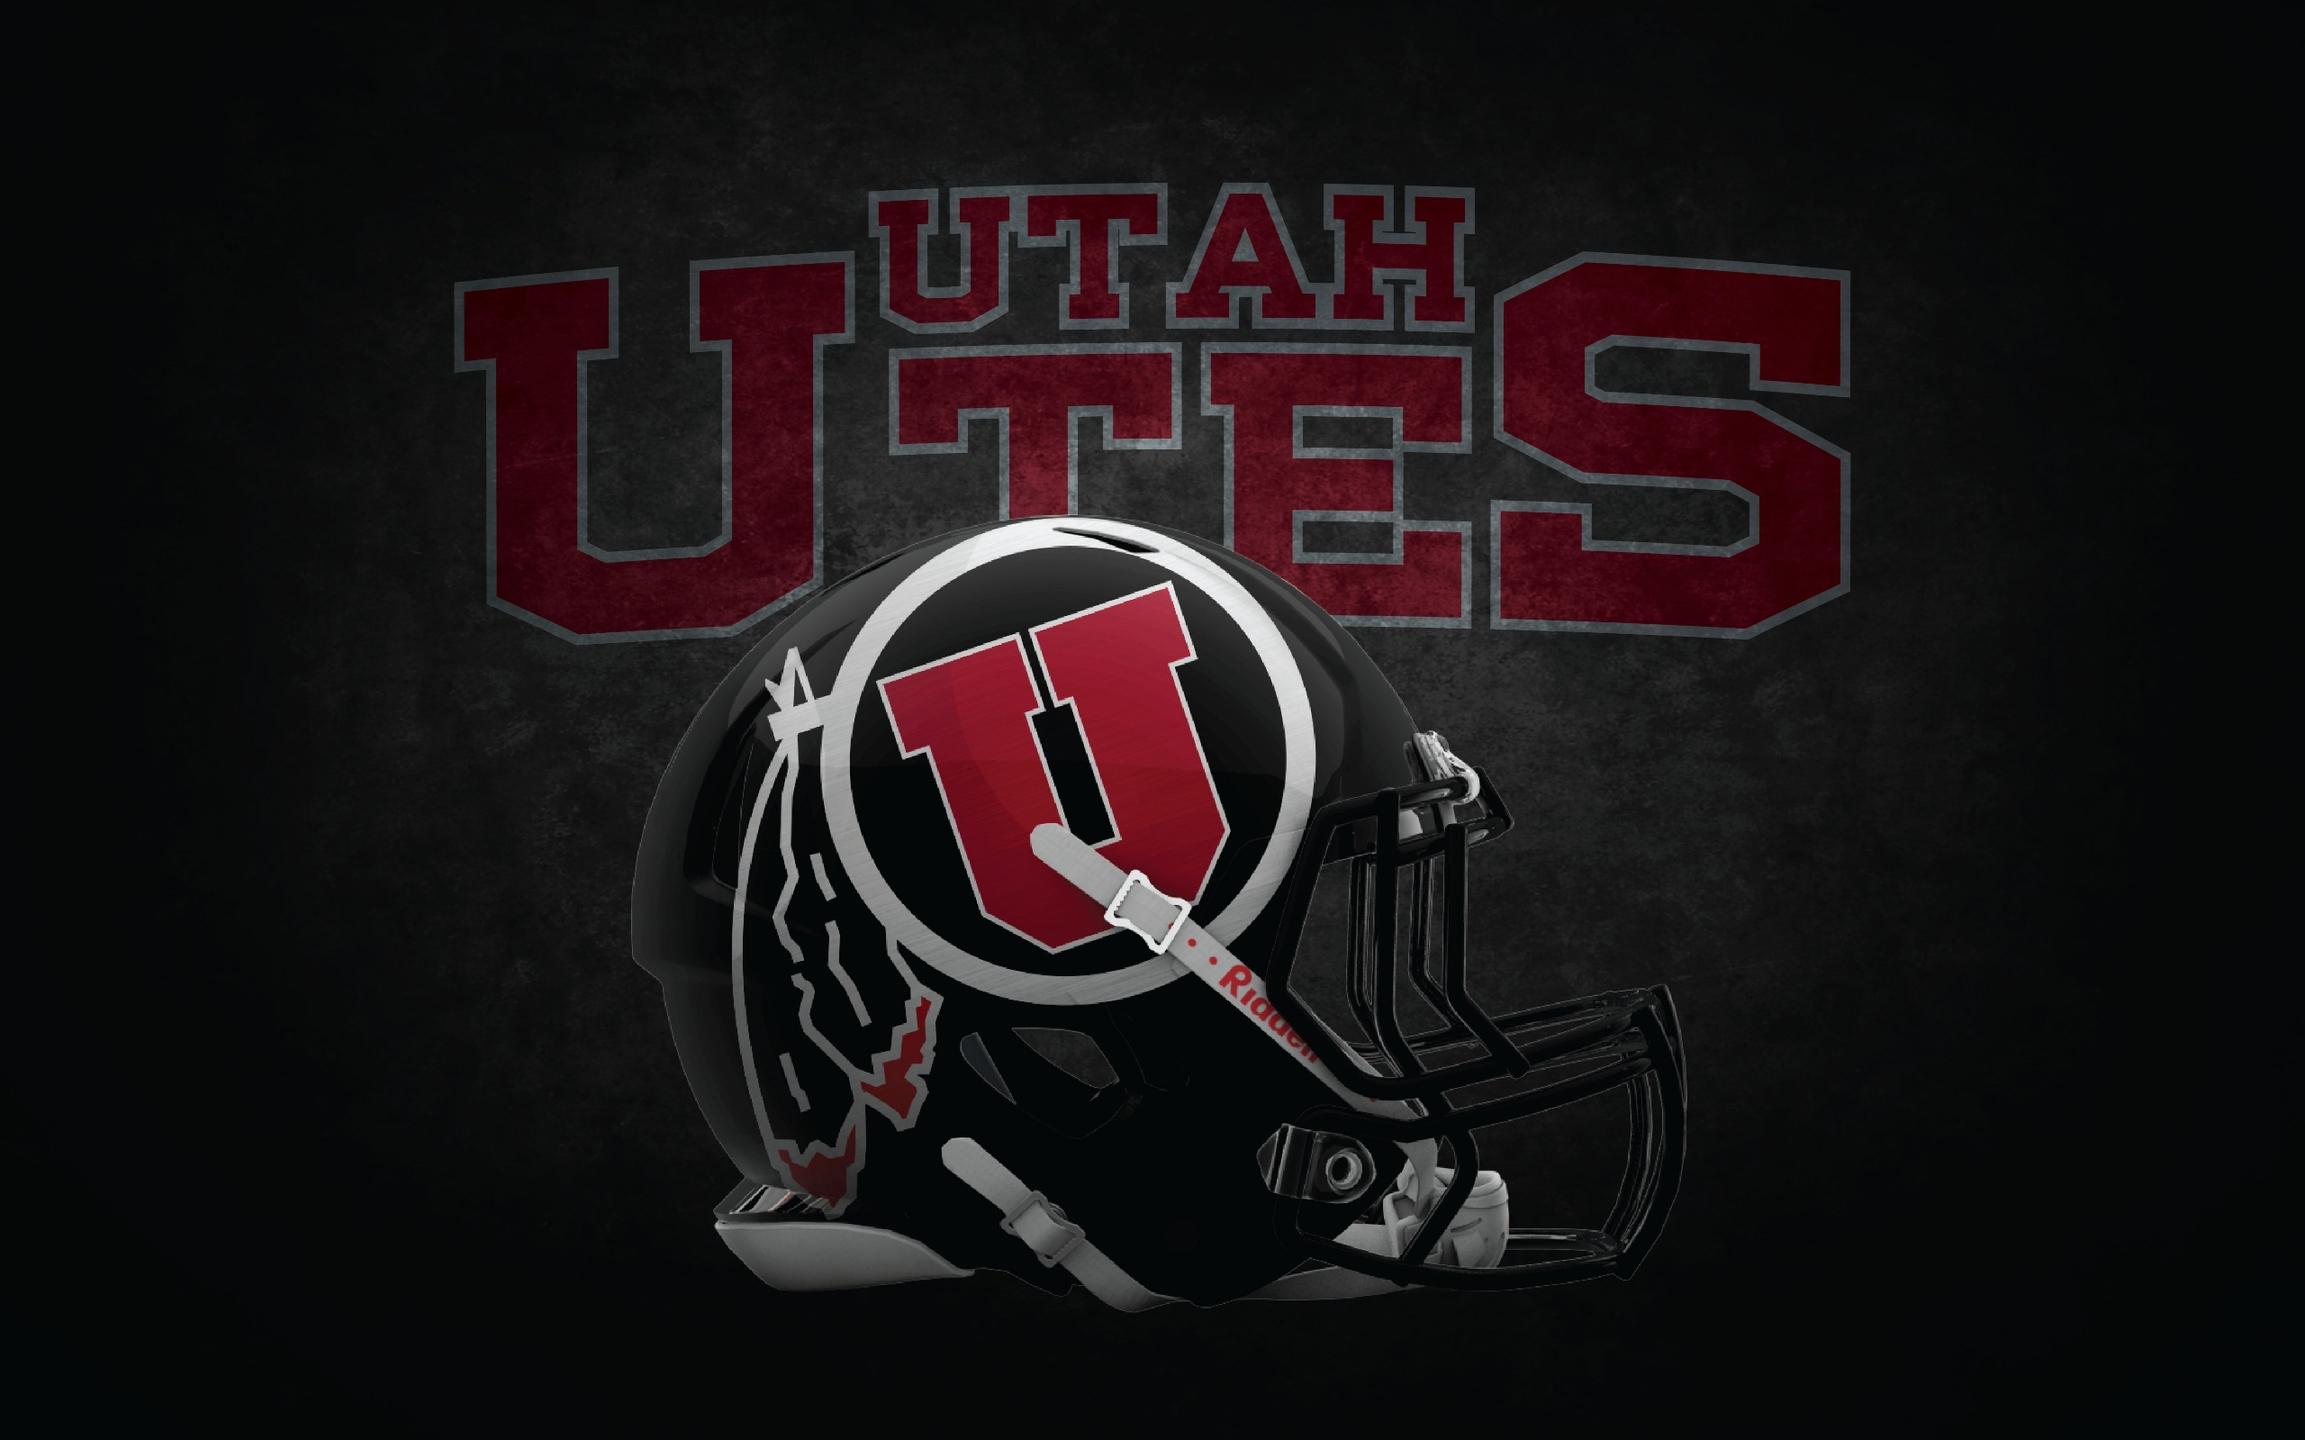 utah Football (@utahfootball1) Cover Image